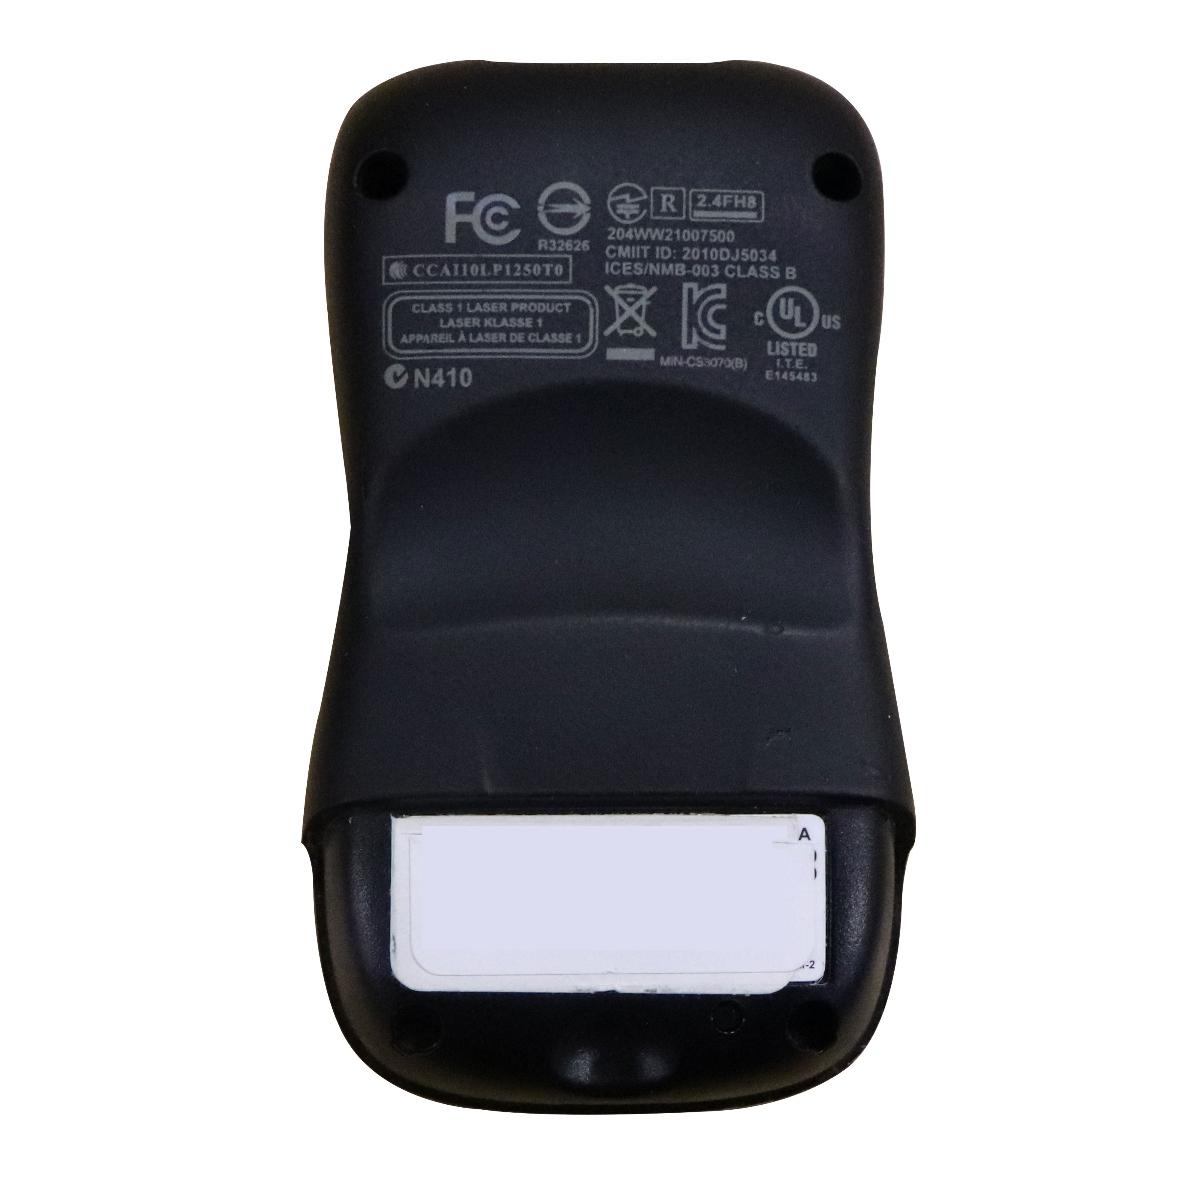 Motorola Symbol Cs3070 Bluetooth Wireless Usb Barcode Scanner Inc